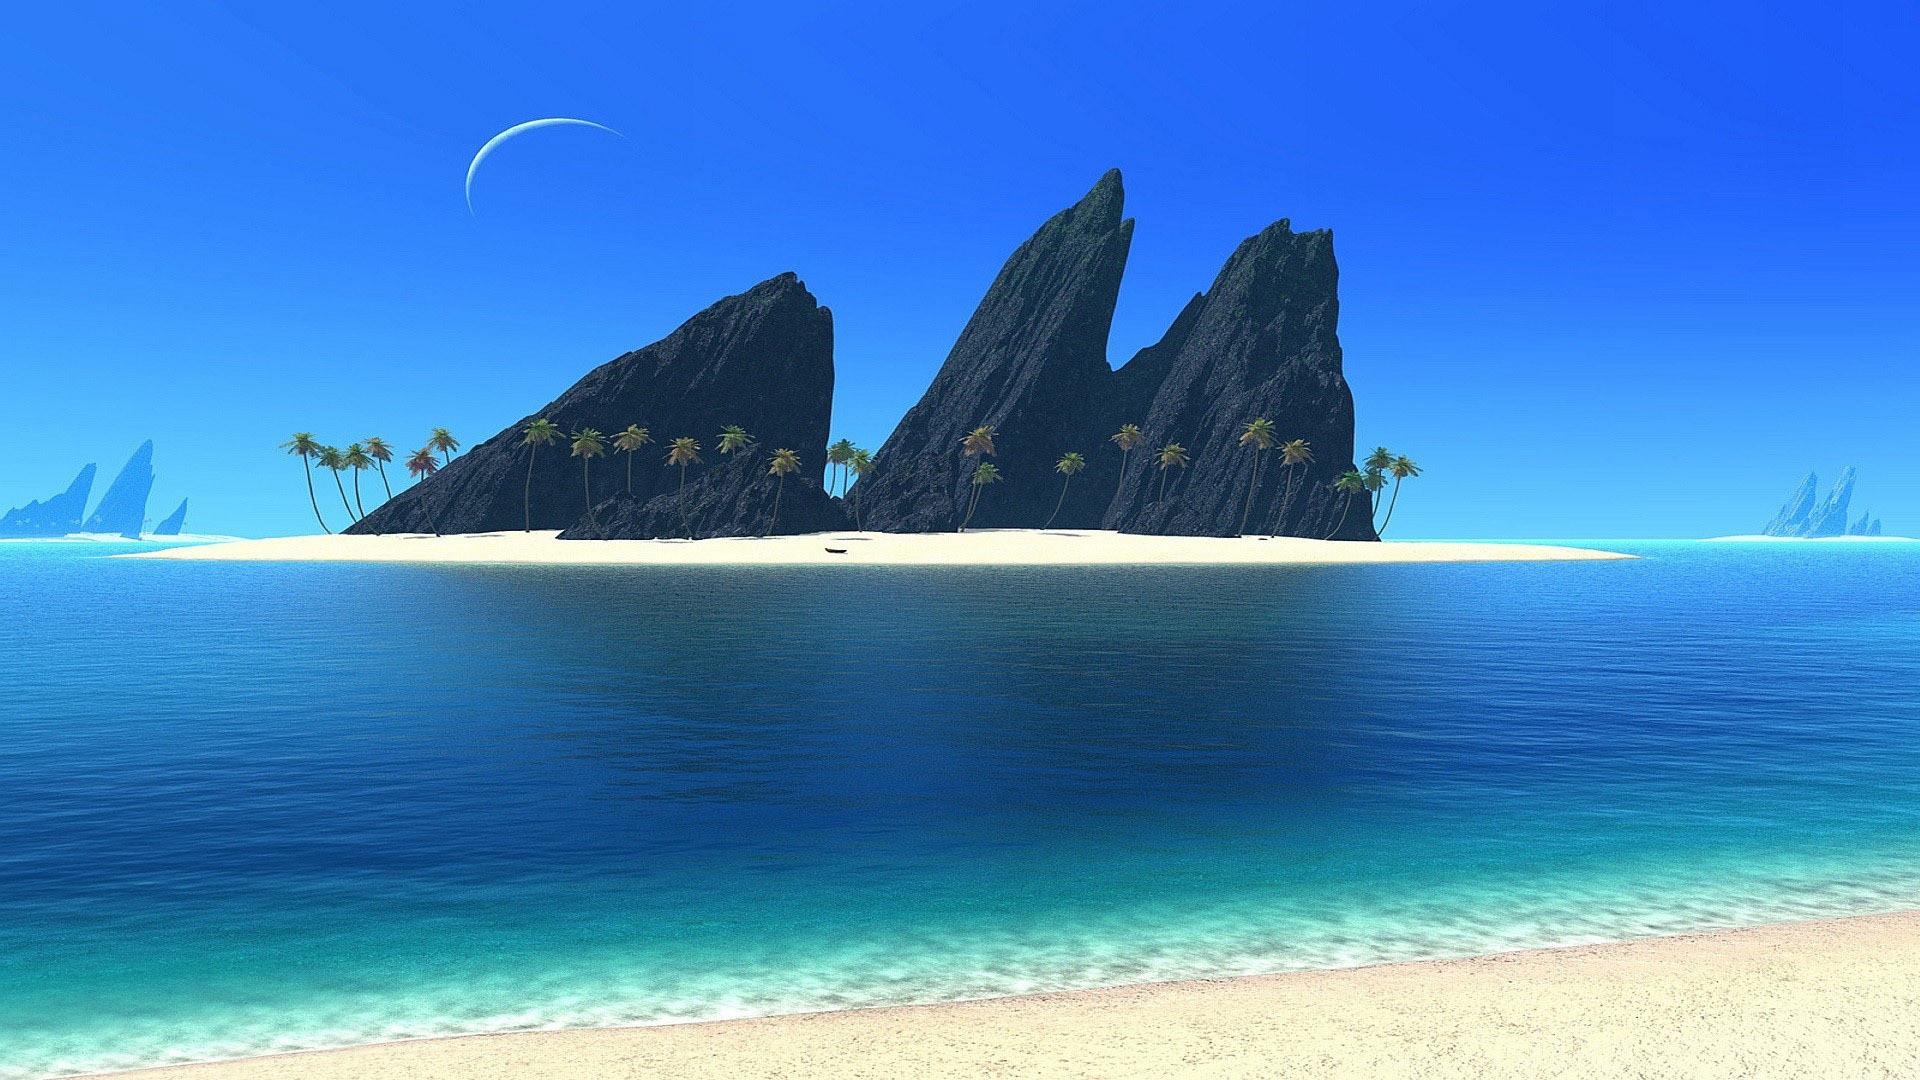 Sunny Beach | Full HD Wallpapers